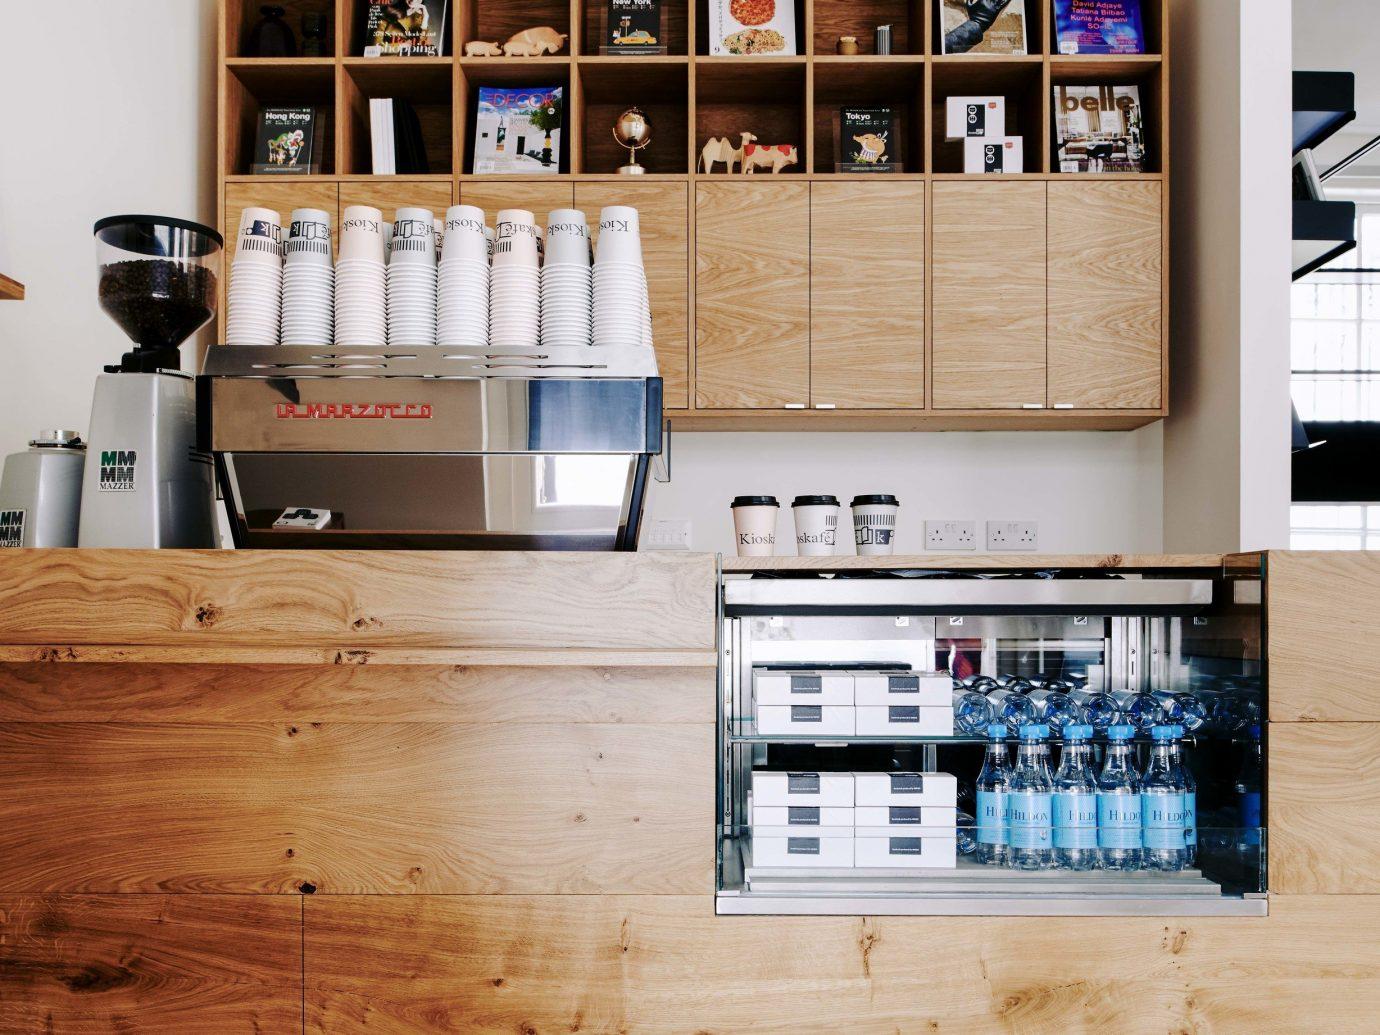 indoor shelving furniture shelf interior design flooring floor bookcase cabinetry Kitchen hardwood coffee Kioskafé Monocle